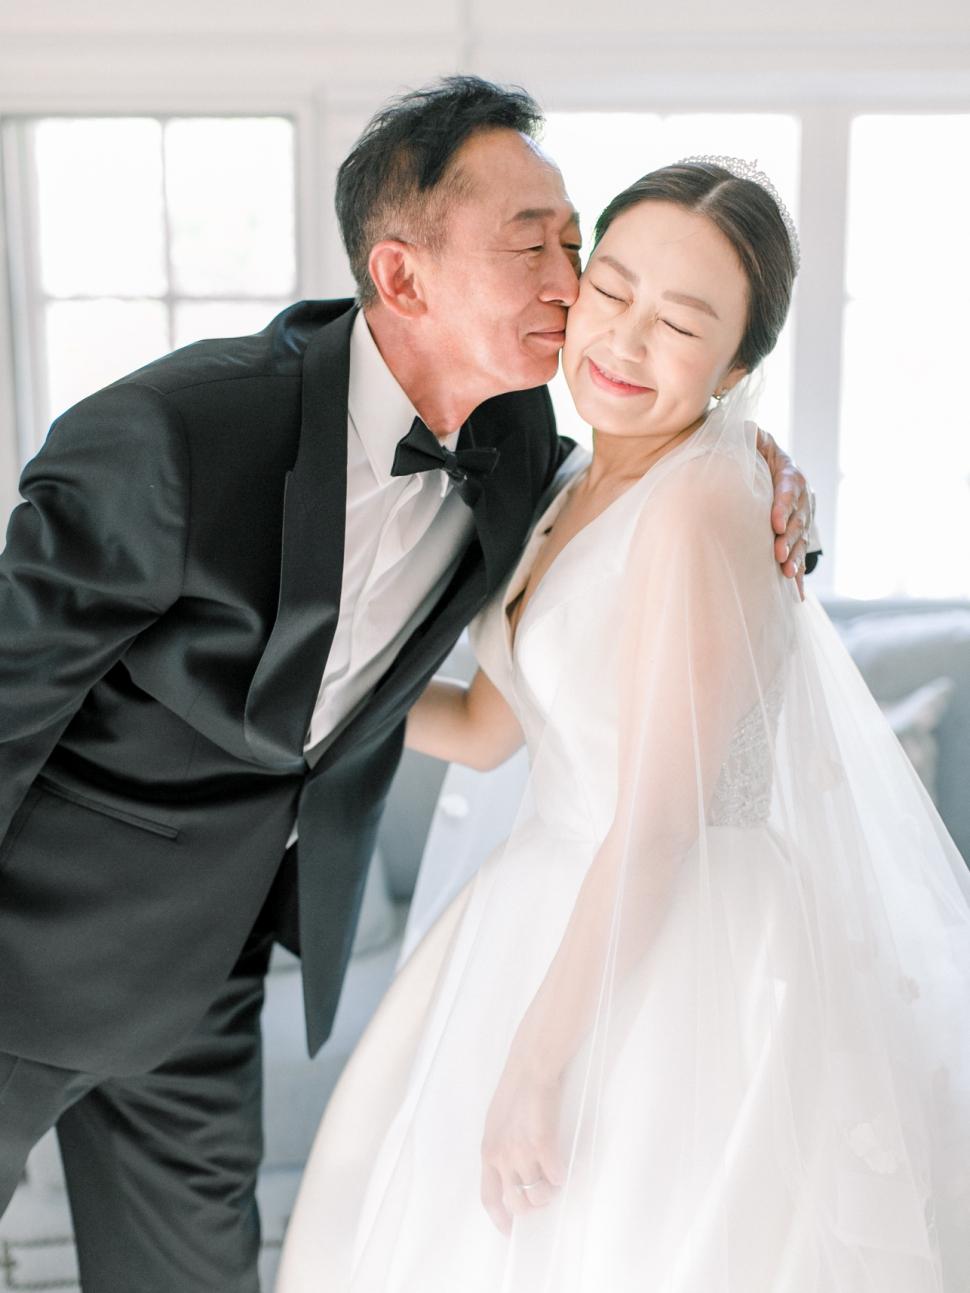 Bourne-Mansion-Wedding-Photos-Cassi-Claire-Long-Island-Wedding-Photographer_13.jpg